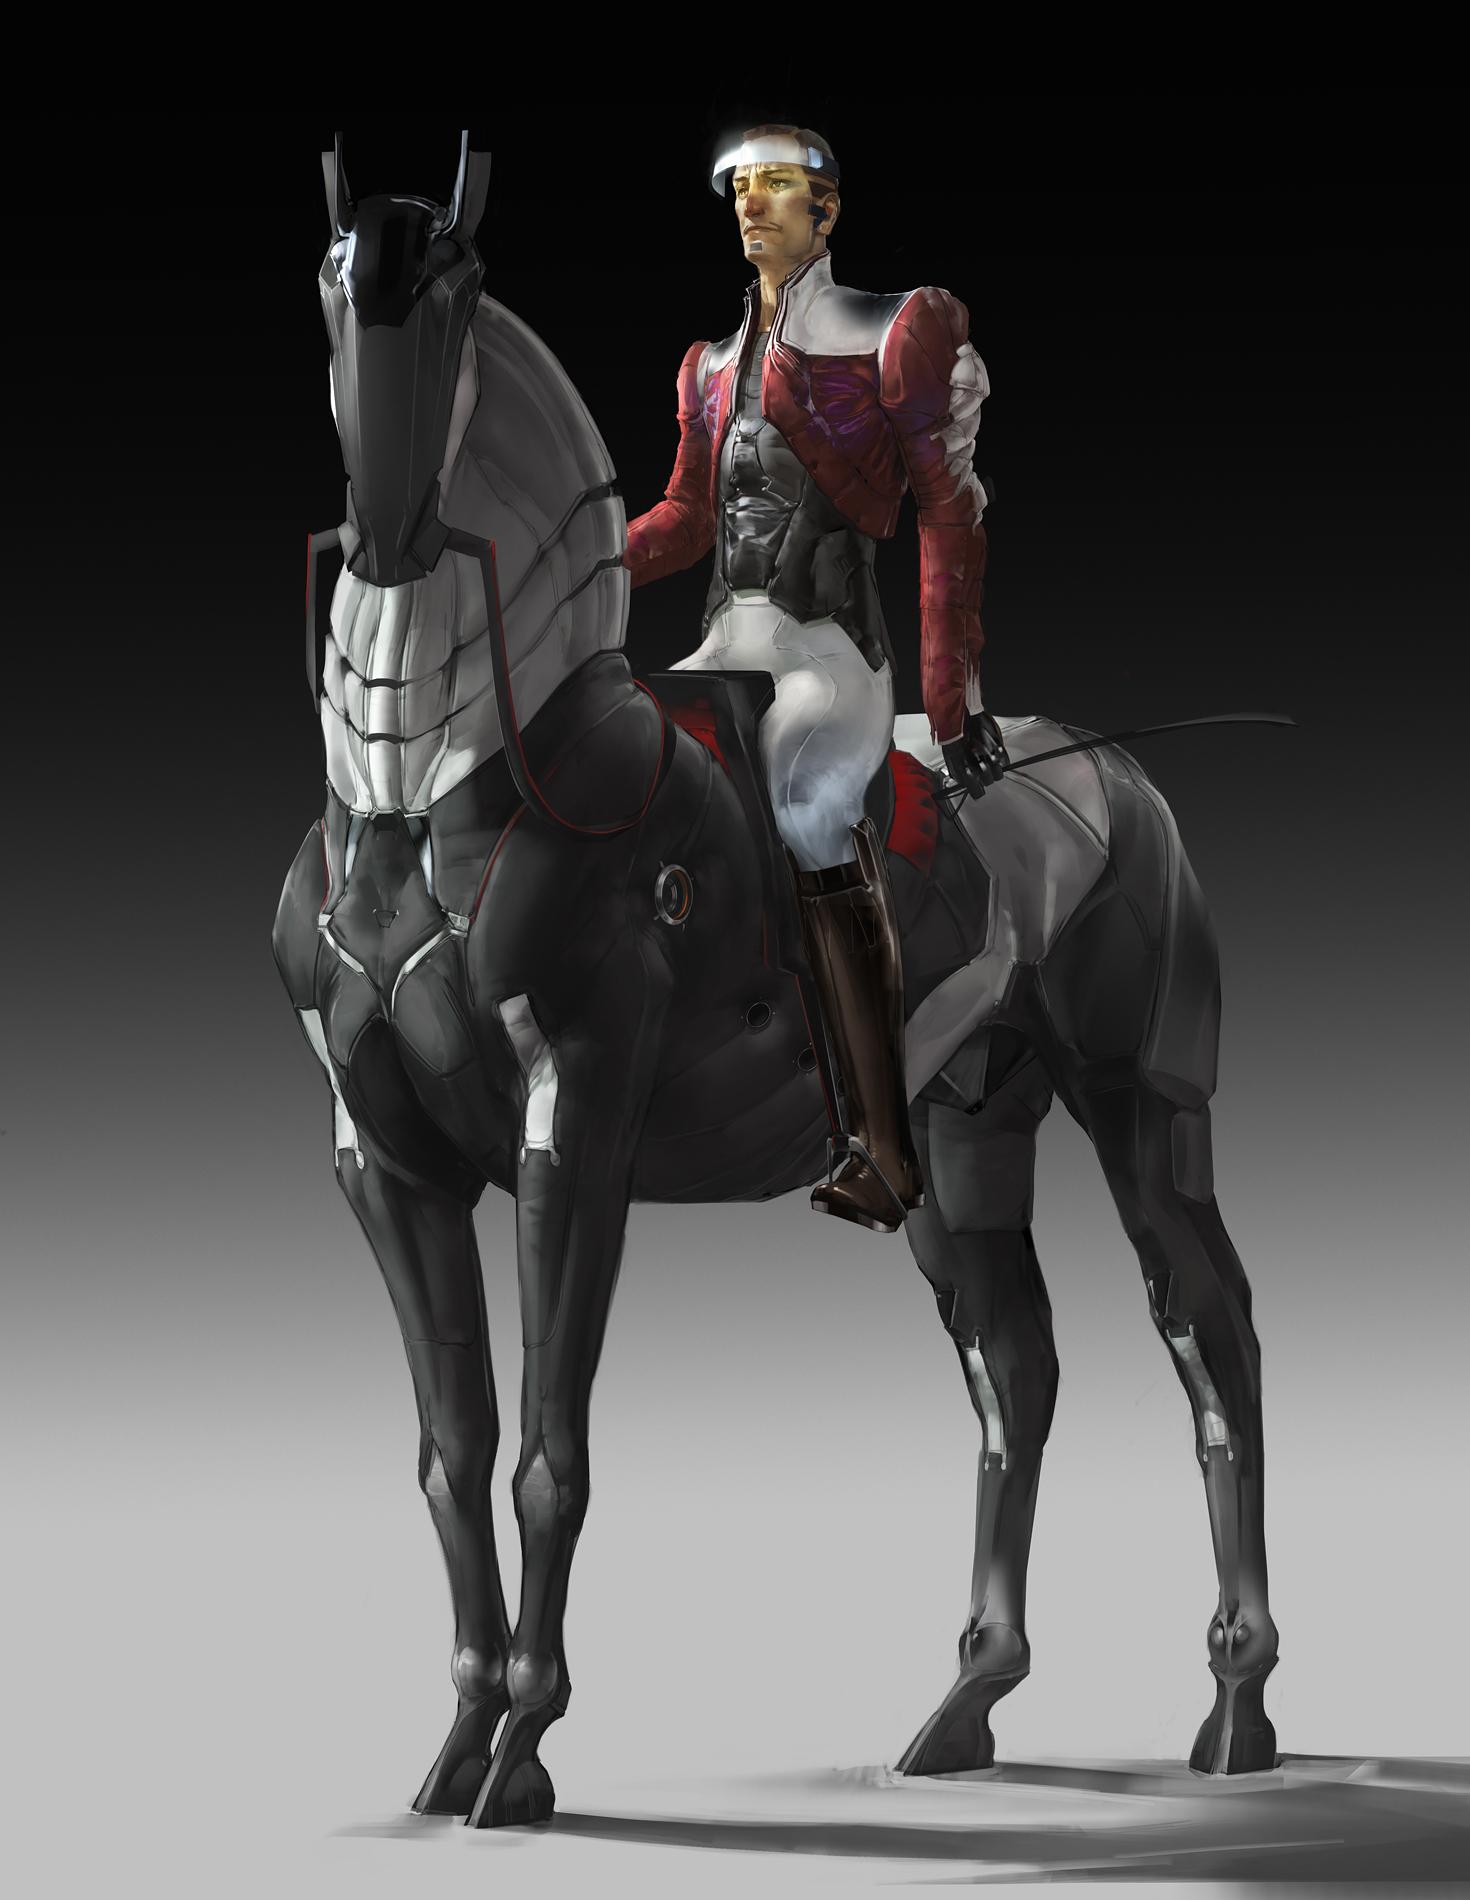 nobleman by Rahmatozz